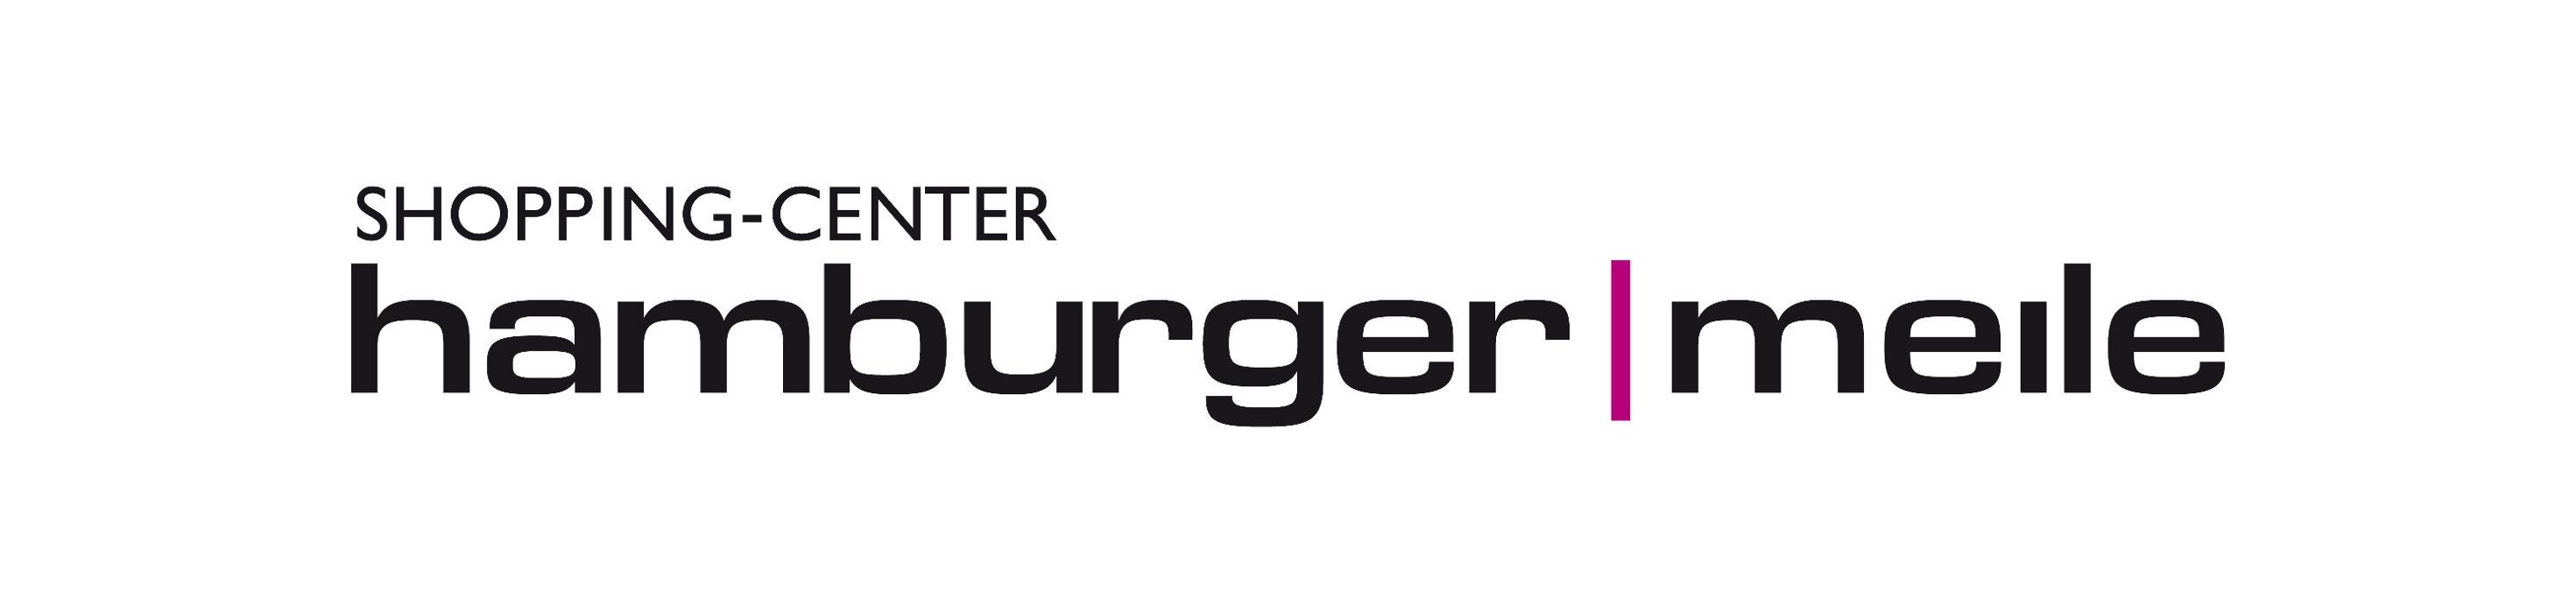 Hamburger Meile Hamburg